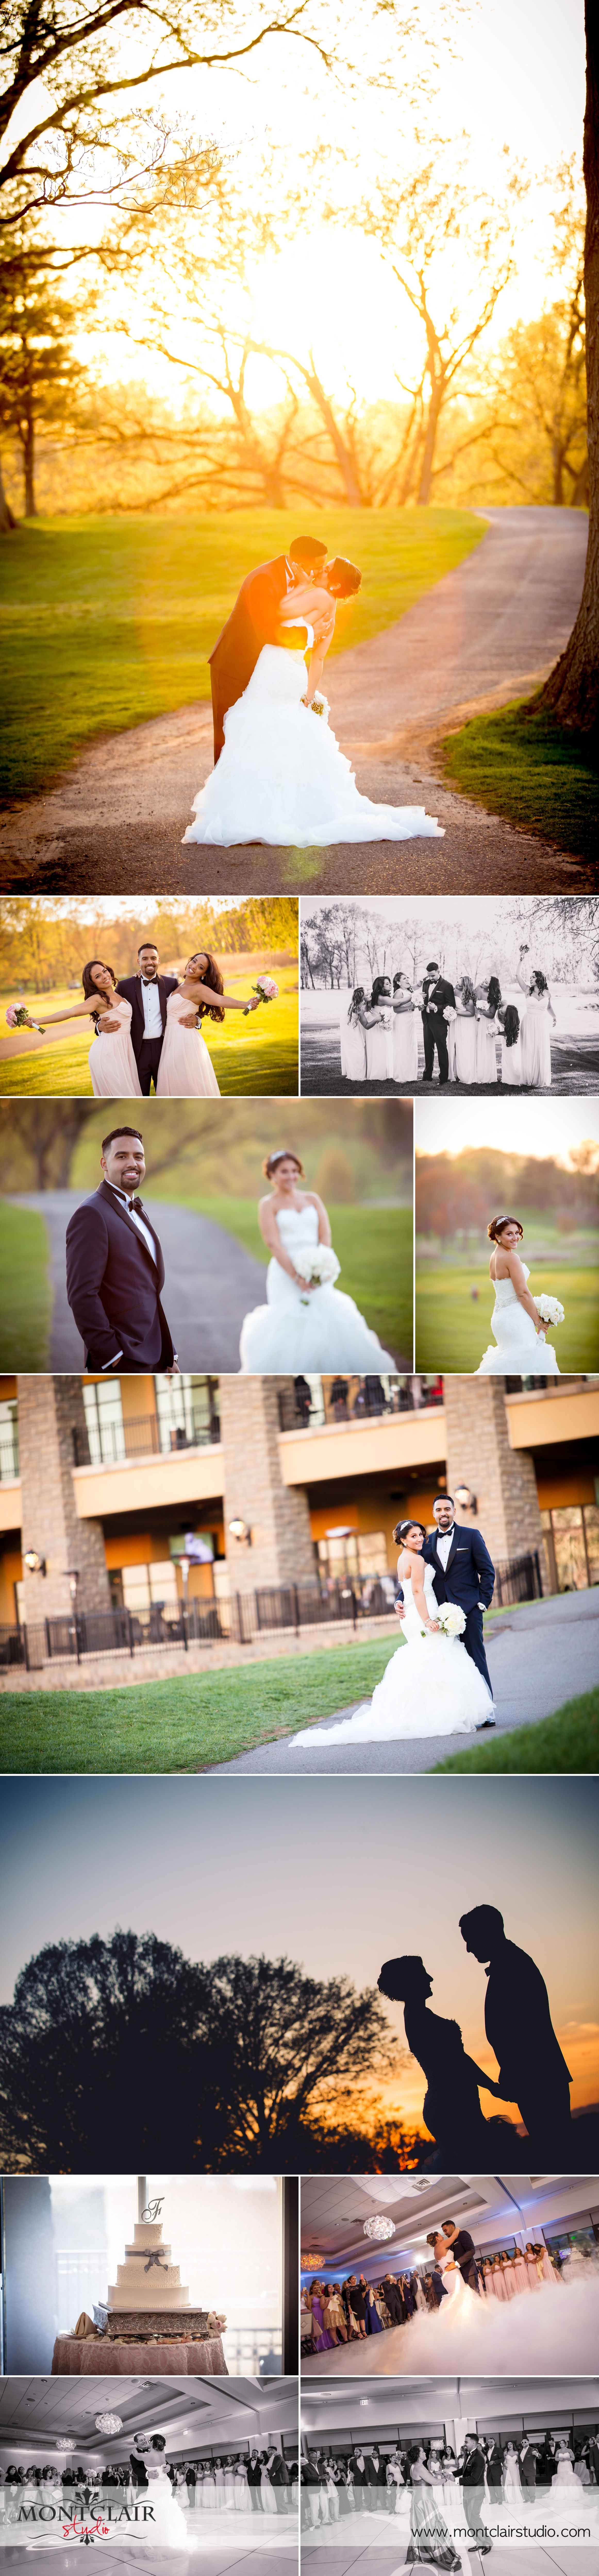 Wedding Jessica and Apolinar 3.jpg